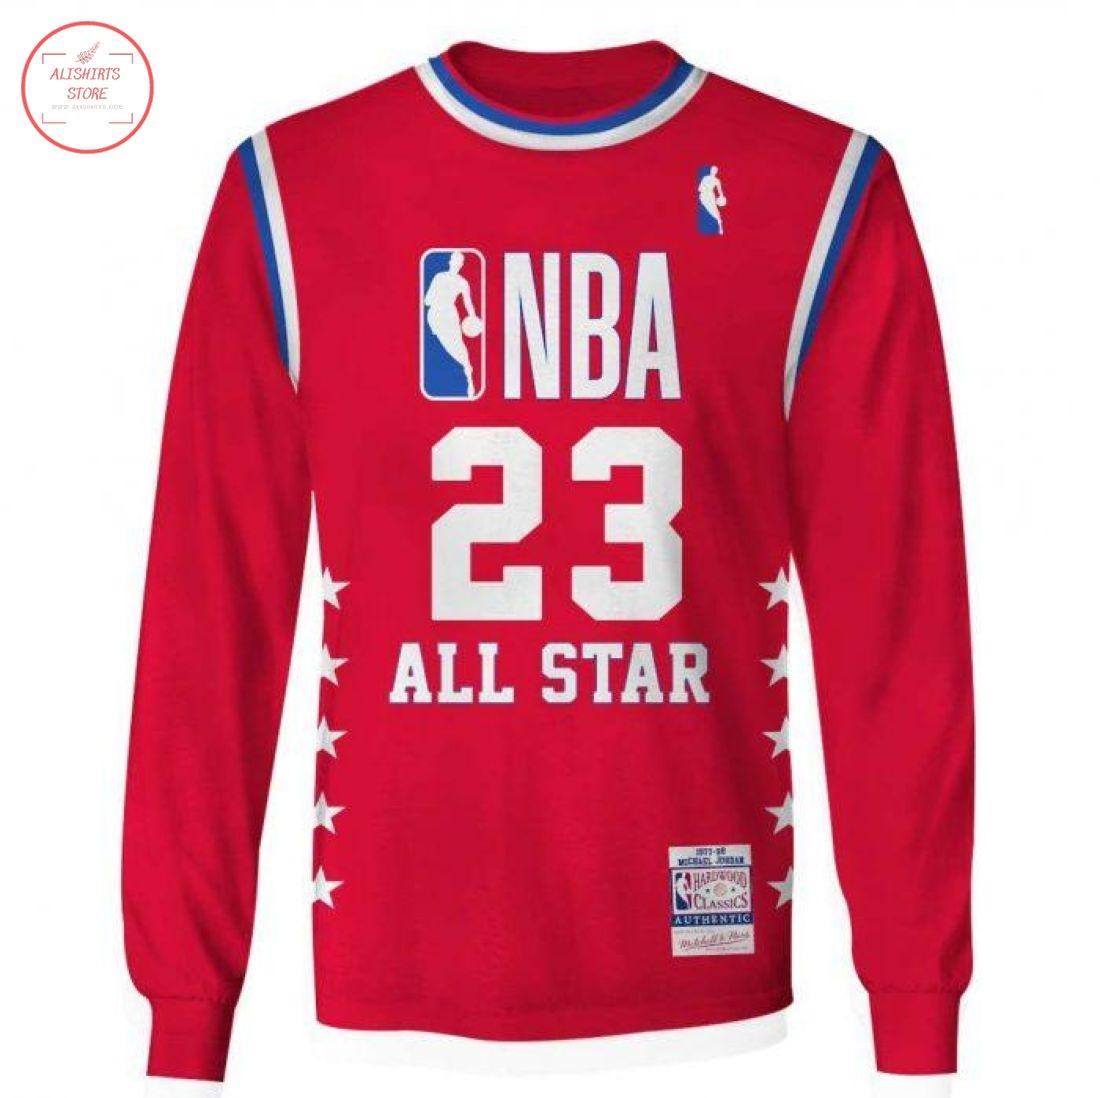 Michael Jordan 23 All Star NBA Sweatshirt